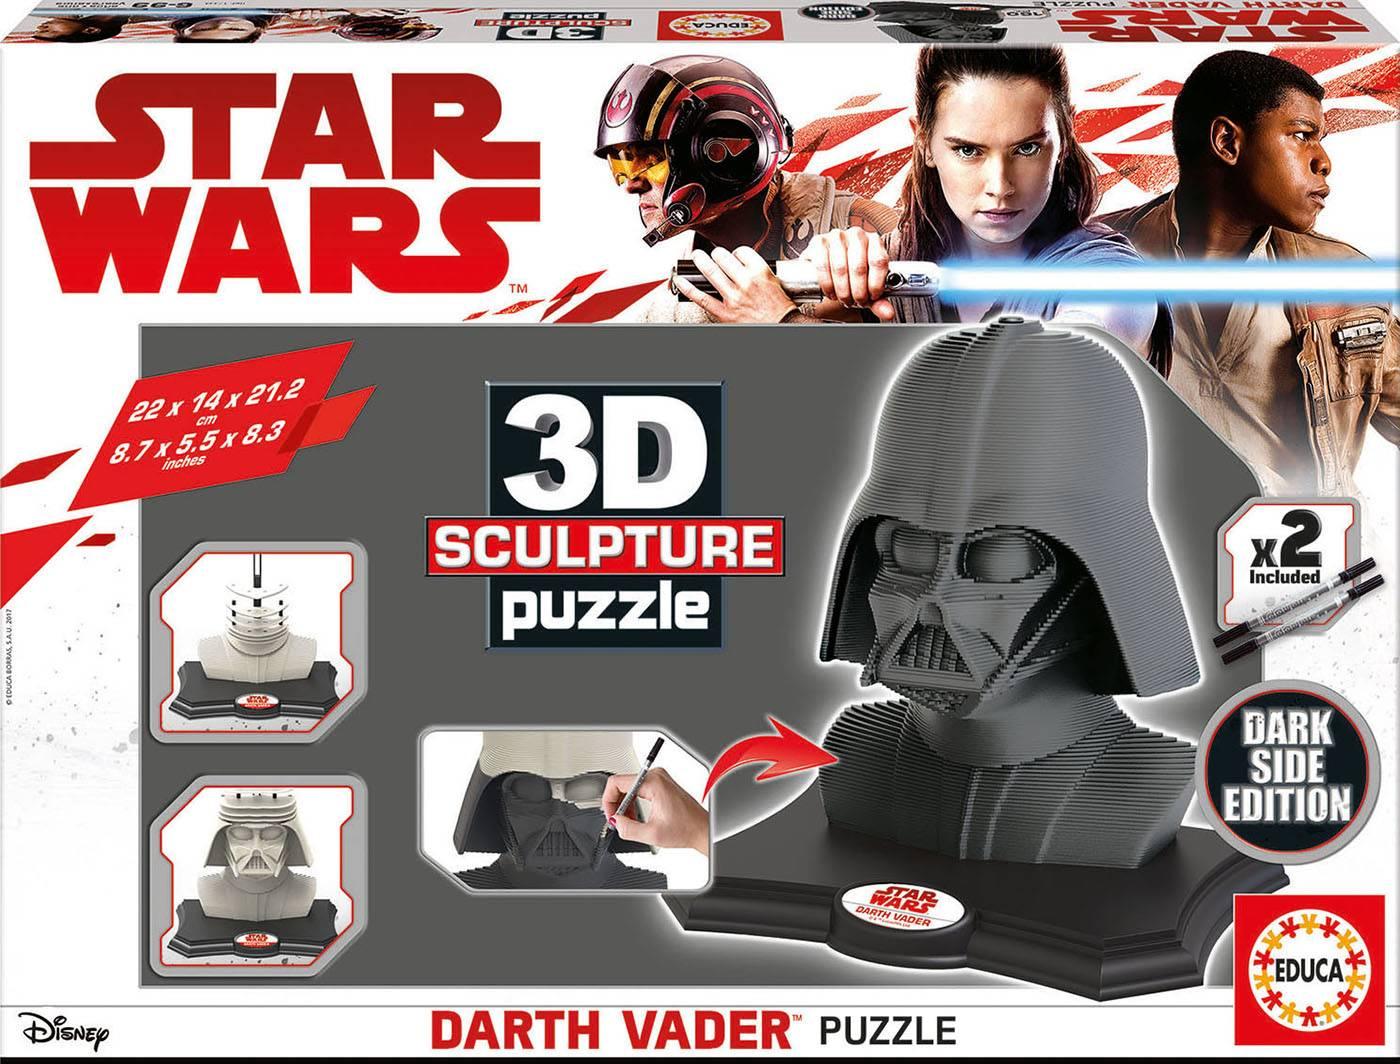 3d sculpture puzzle - 3d sculpture puzzle darth vader - dark side edit